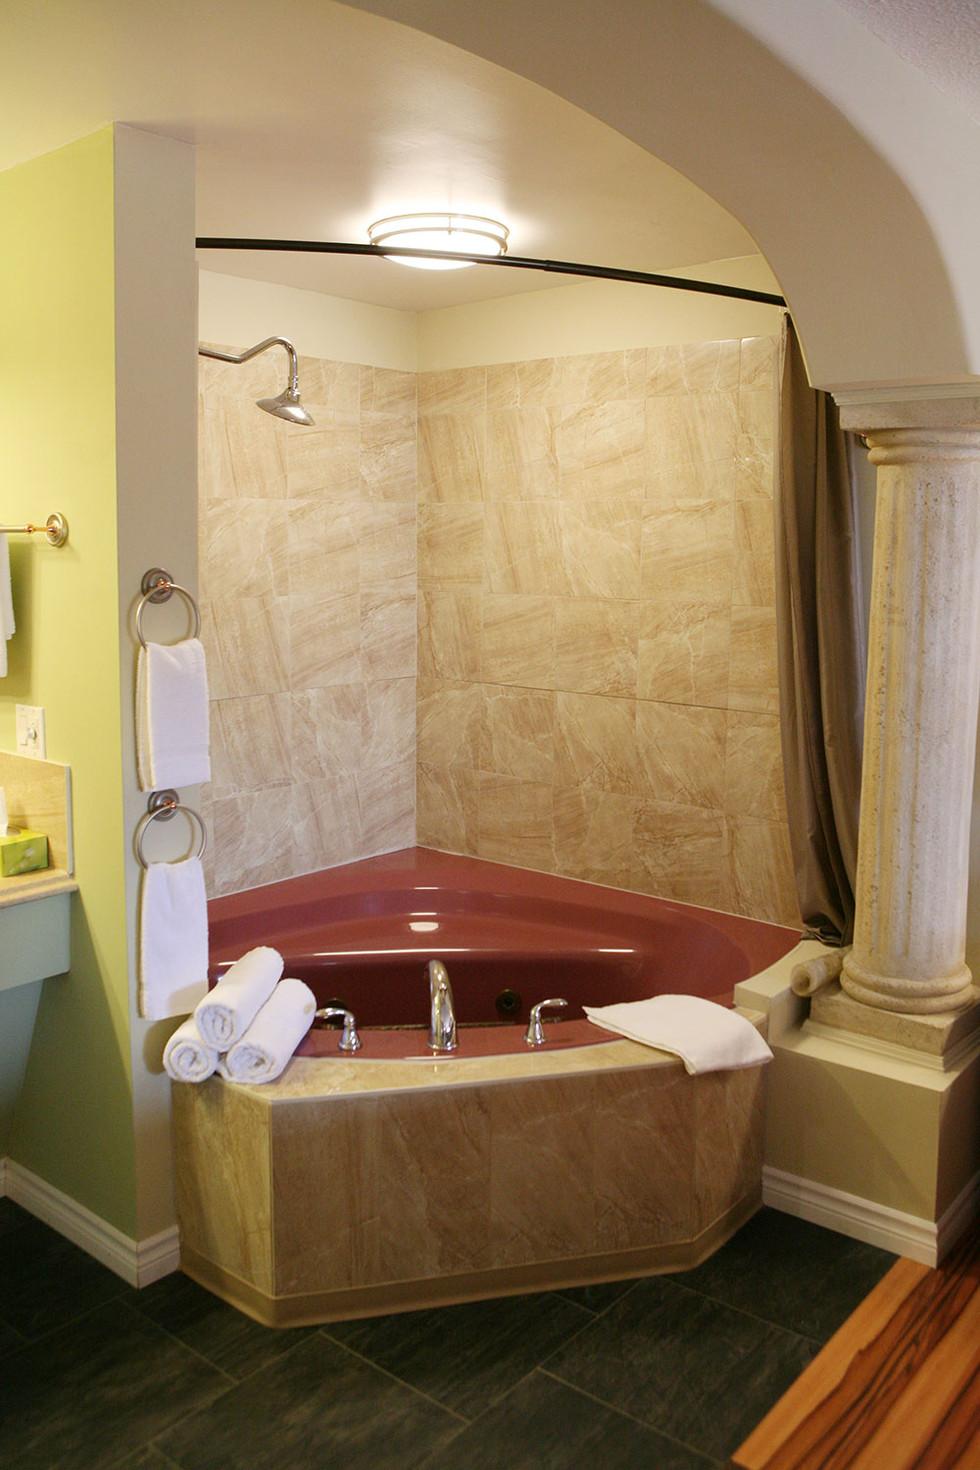 Luxurious Whirlpool Bath